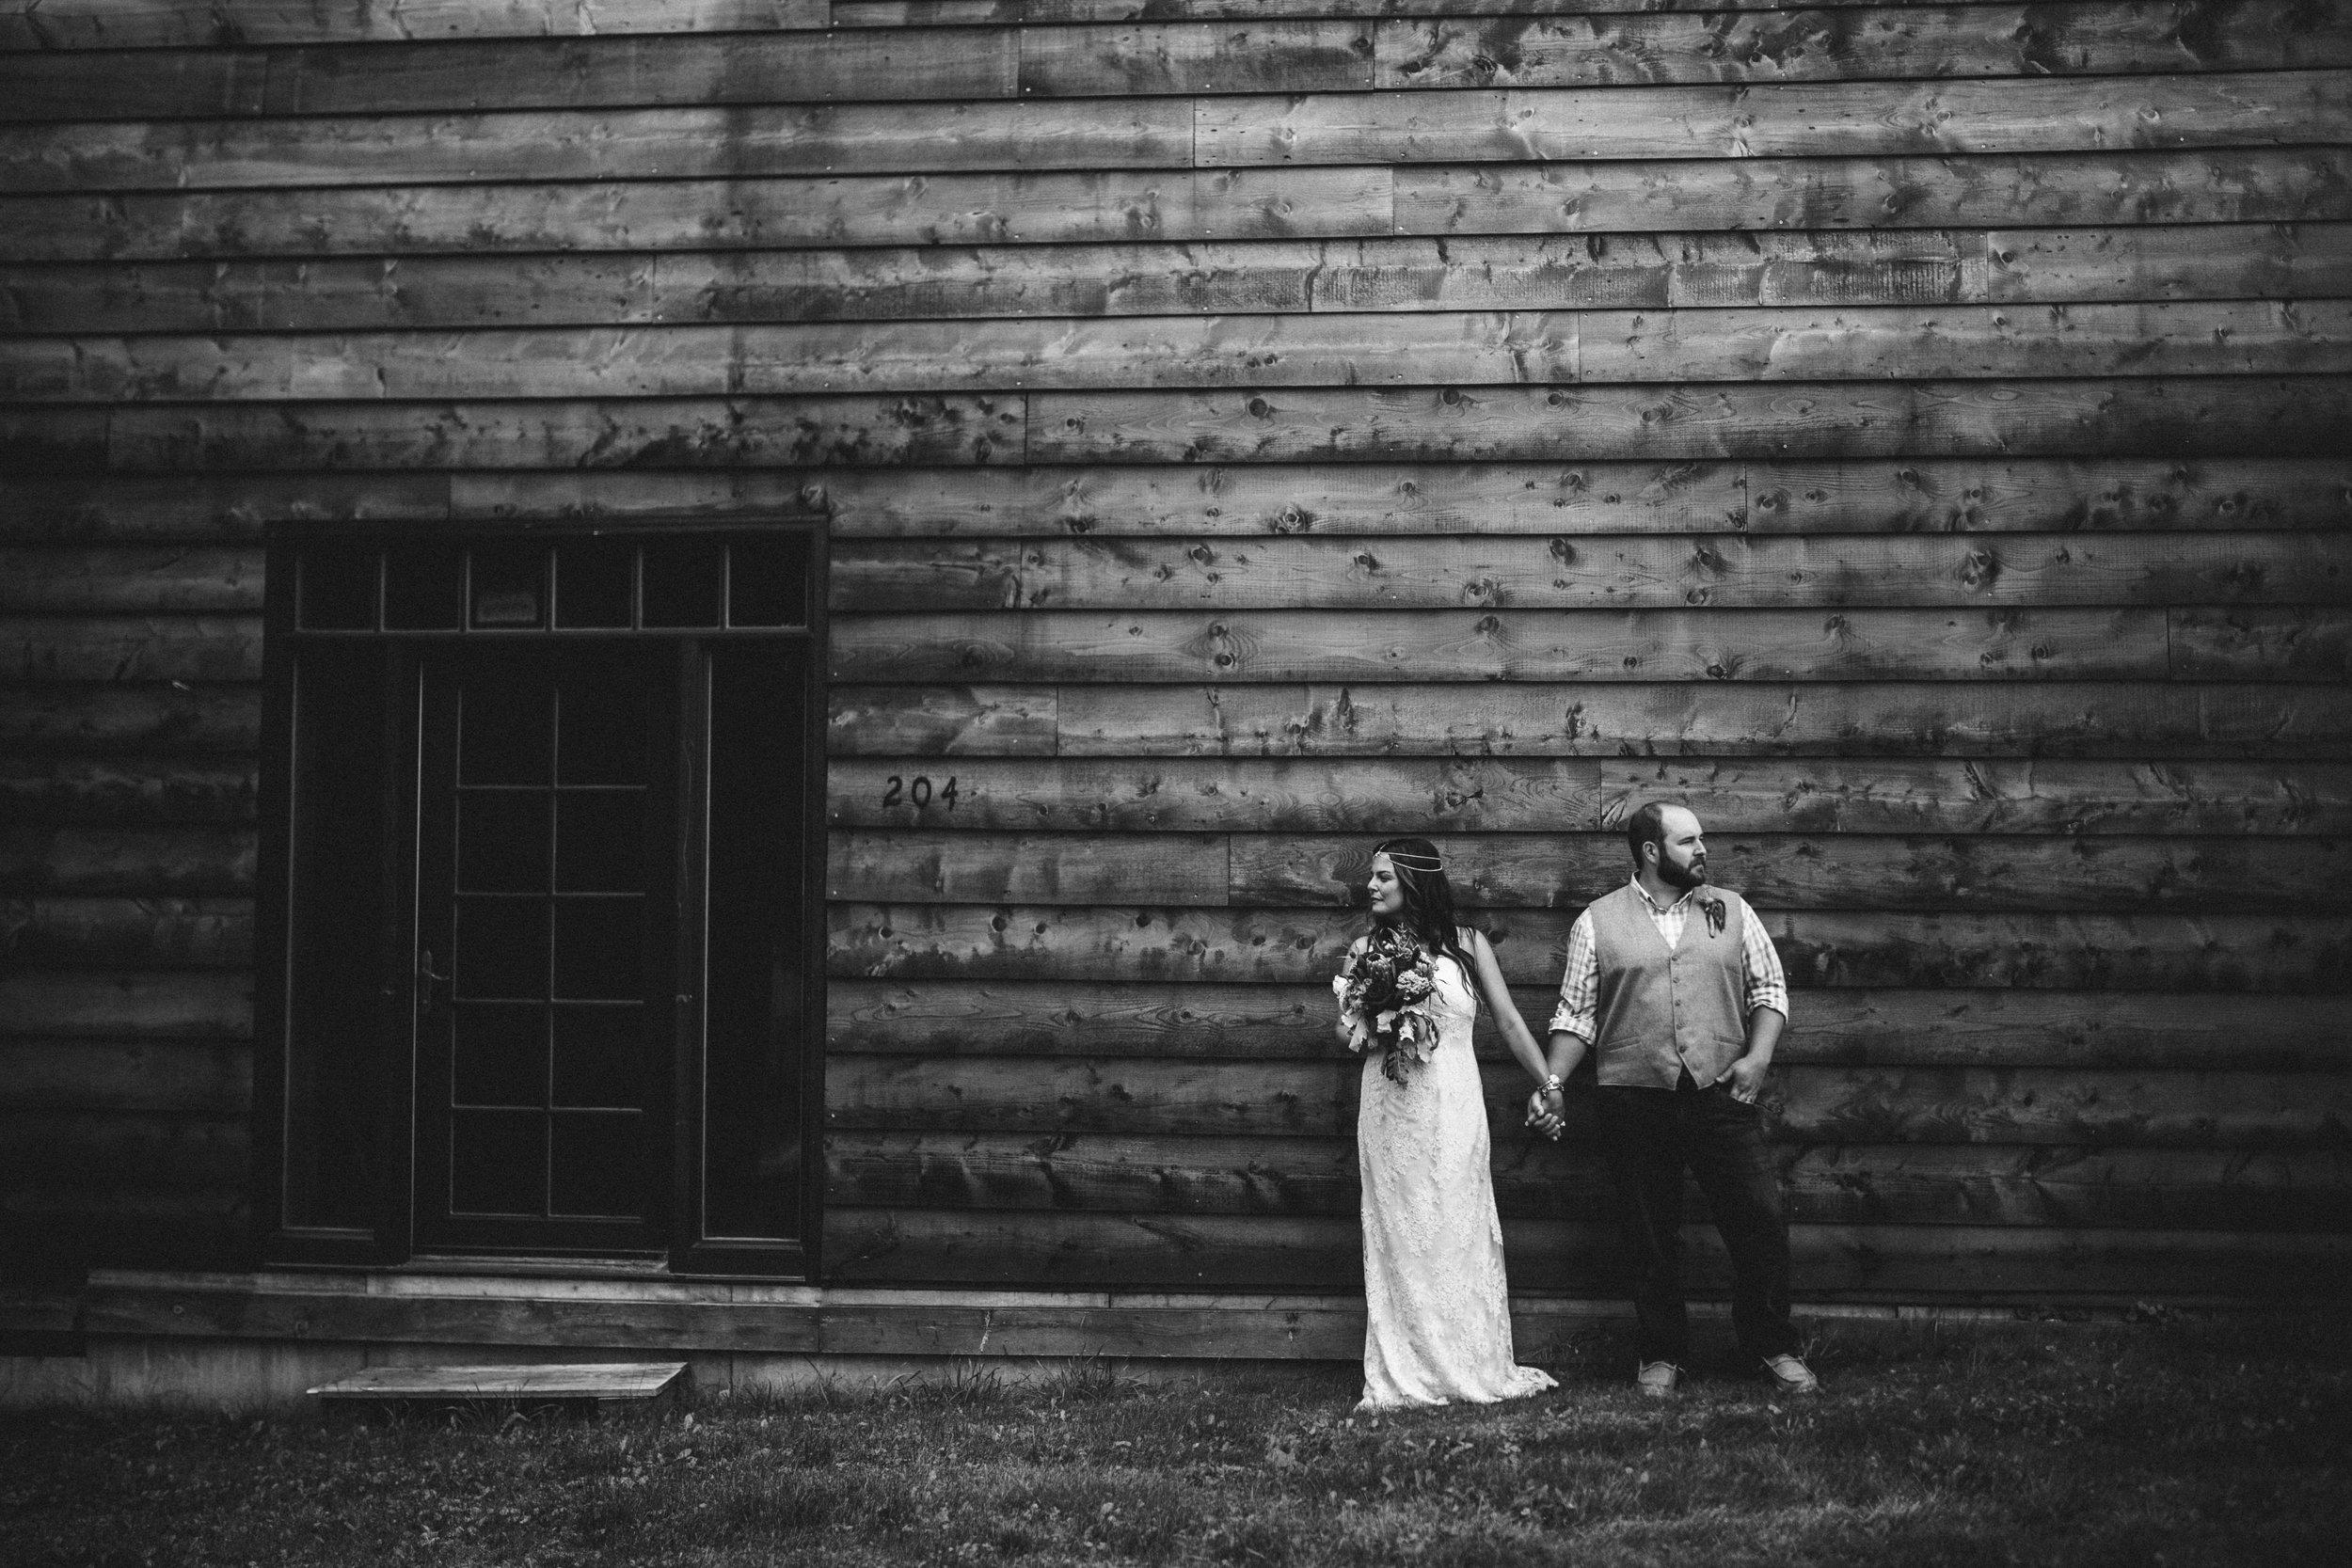 Bohemian Wedding - Sabrina Leigh Studios - Northern Michigan Wedding Photographer062.jpg